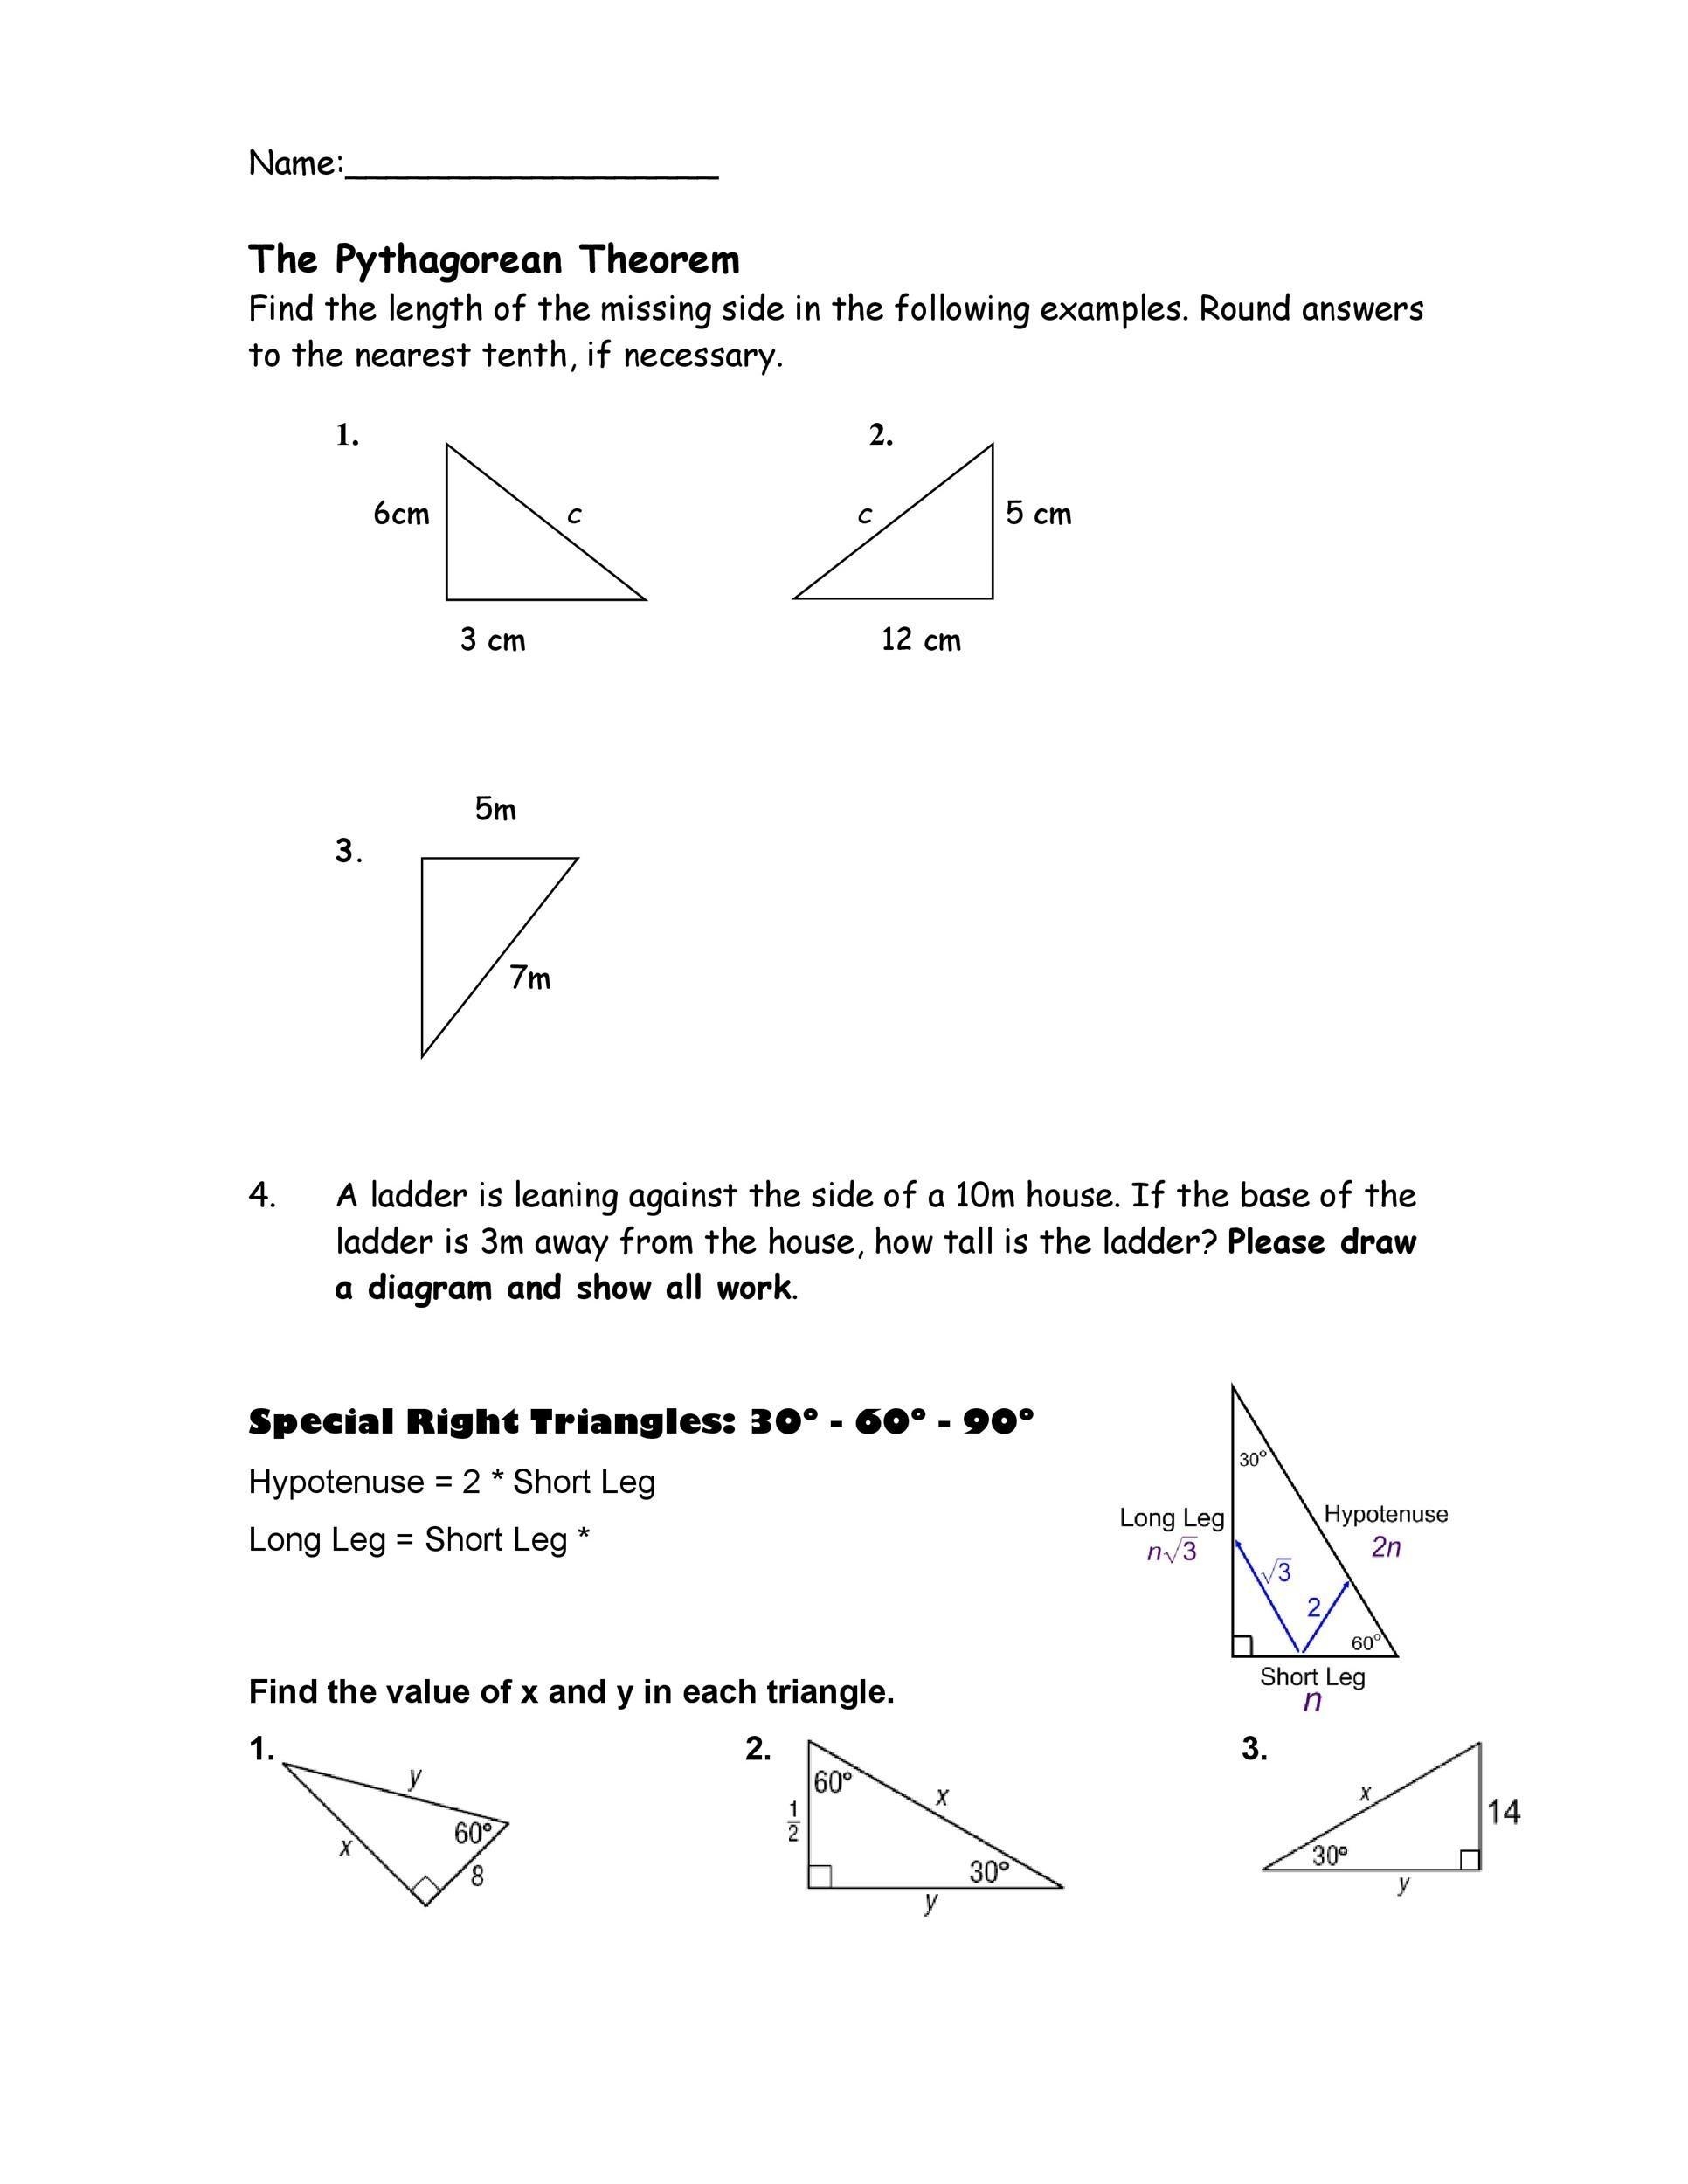 Free pythagorean theorem 27